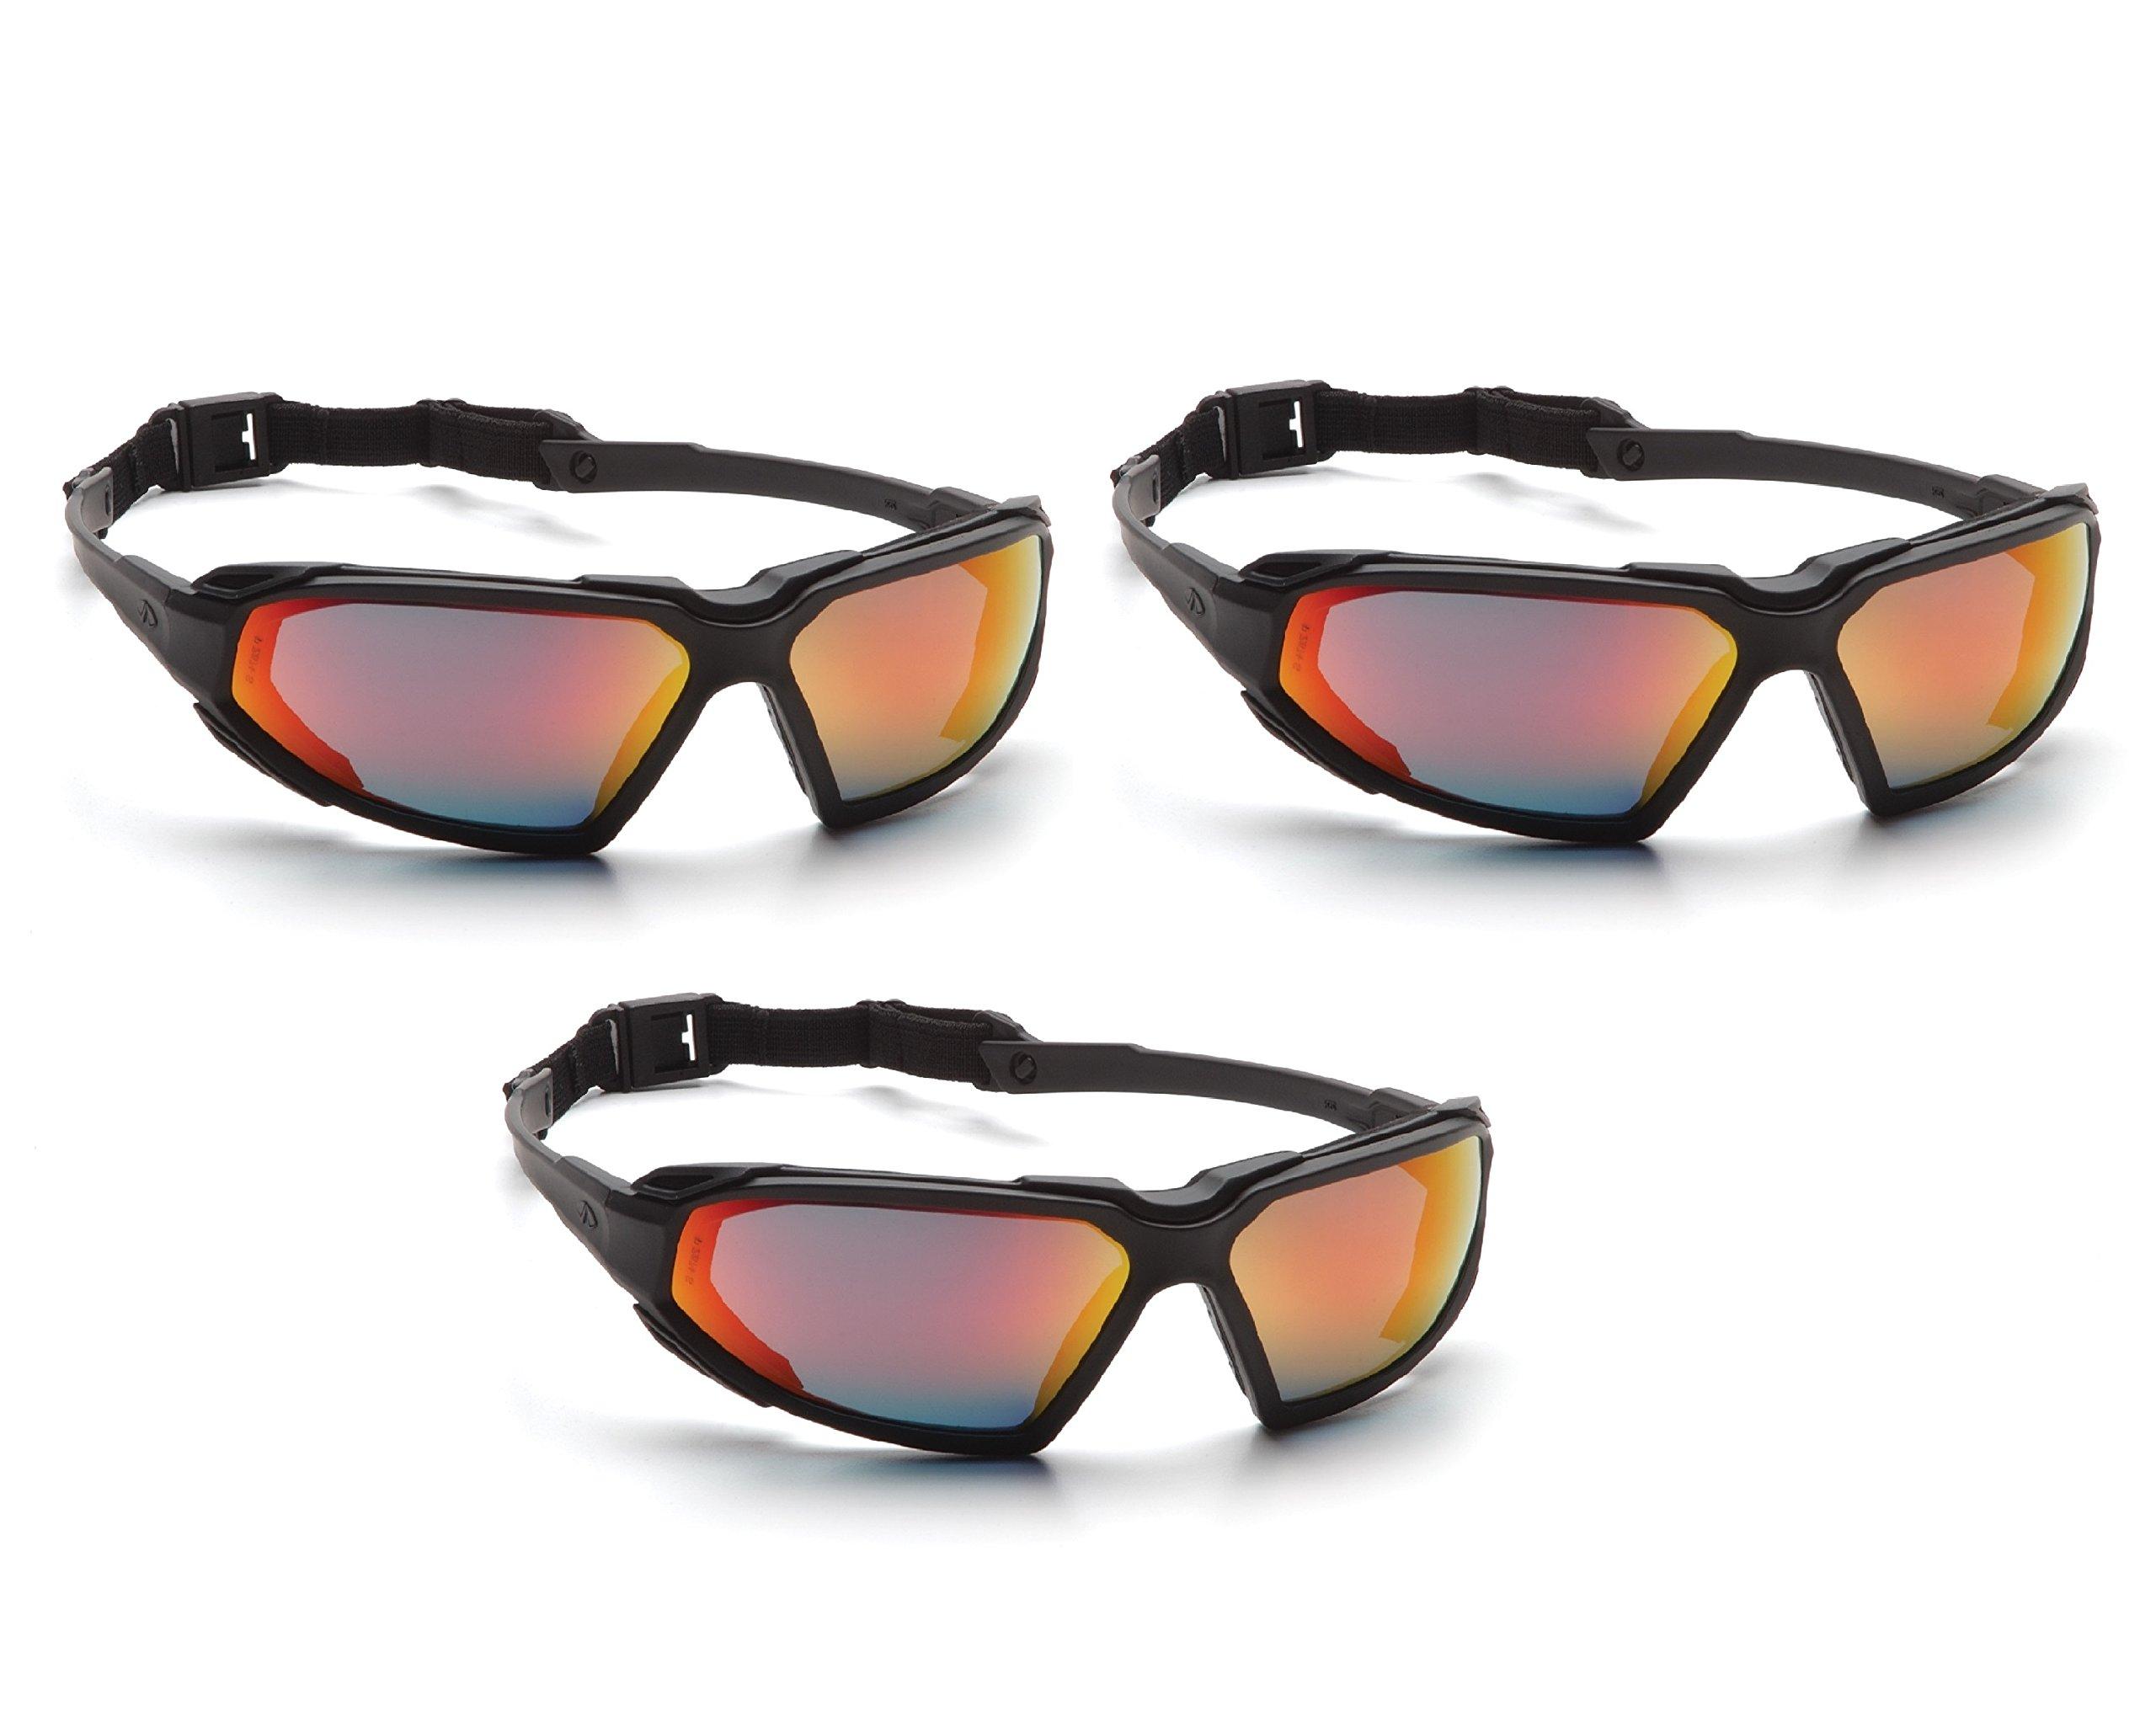 Highlander Safety Glasses Pyramex SBB5055DT (Black Frame/Sky Red Mirror Anti-Fog Lens) (3) by Highlander